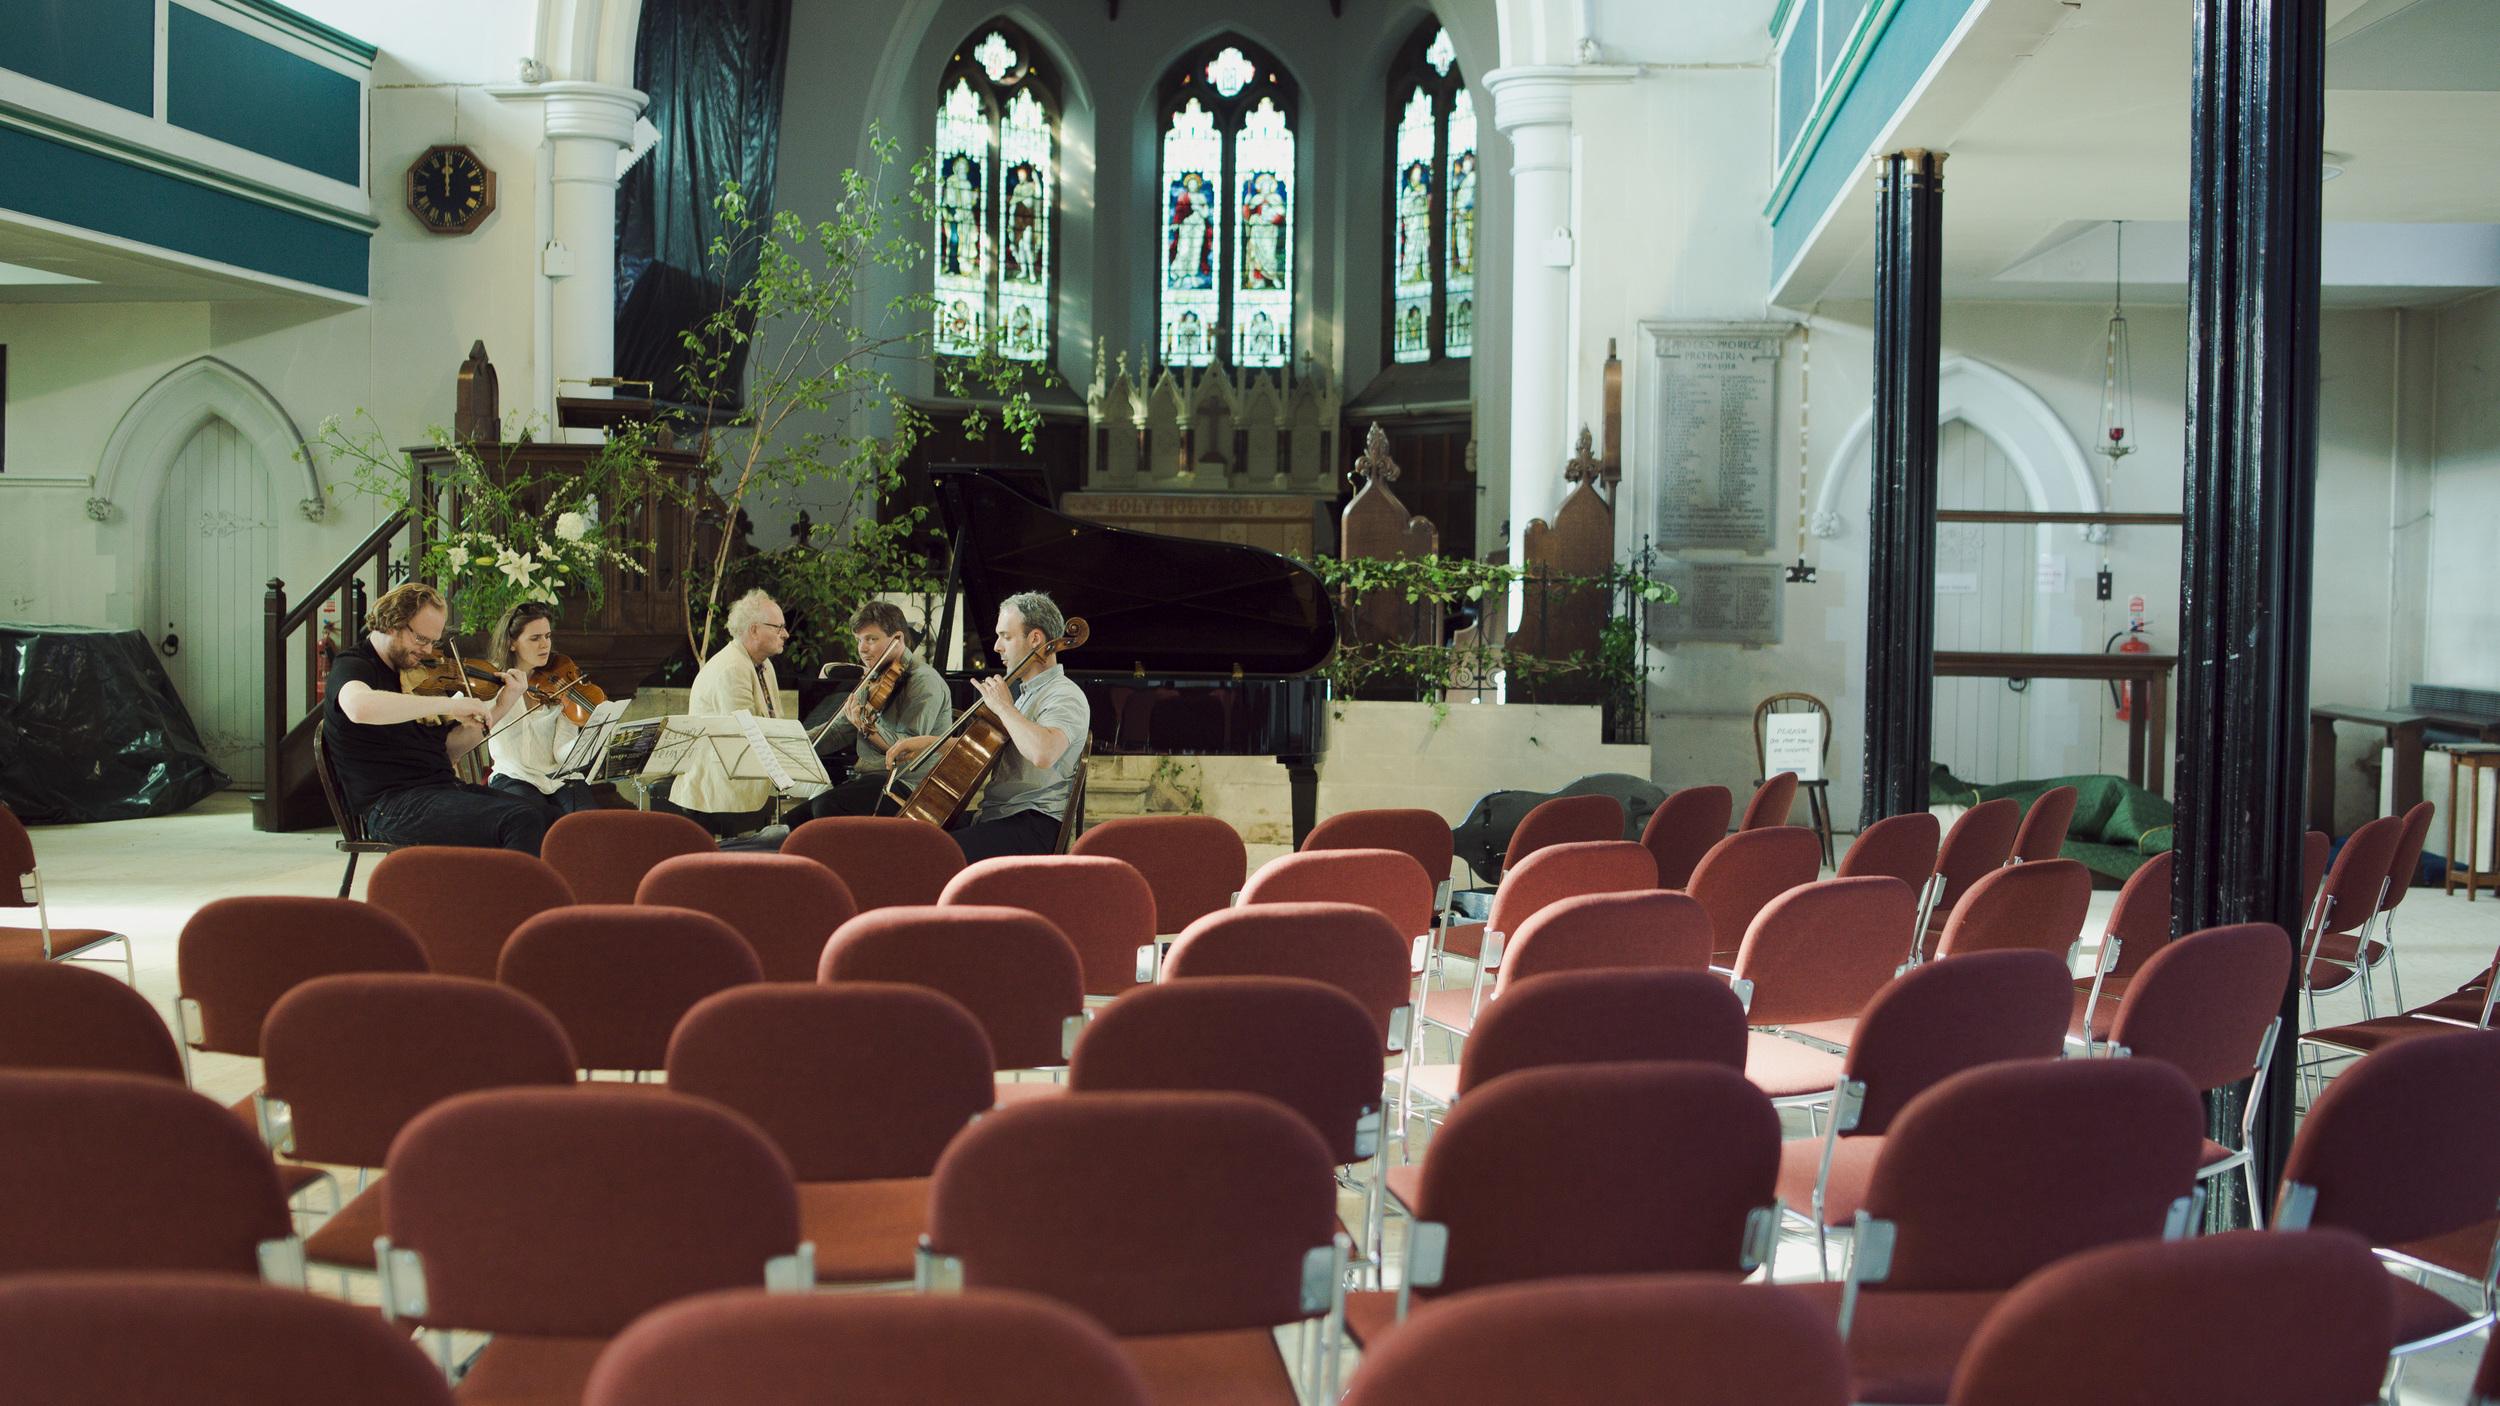 Michael Gurevich, Beatrice Philips, Bengt Forsberg, James Boyd and Pierre Doumenge rehearsing Catoire's Piano Quintet in G Minor, Op. 28.